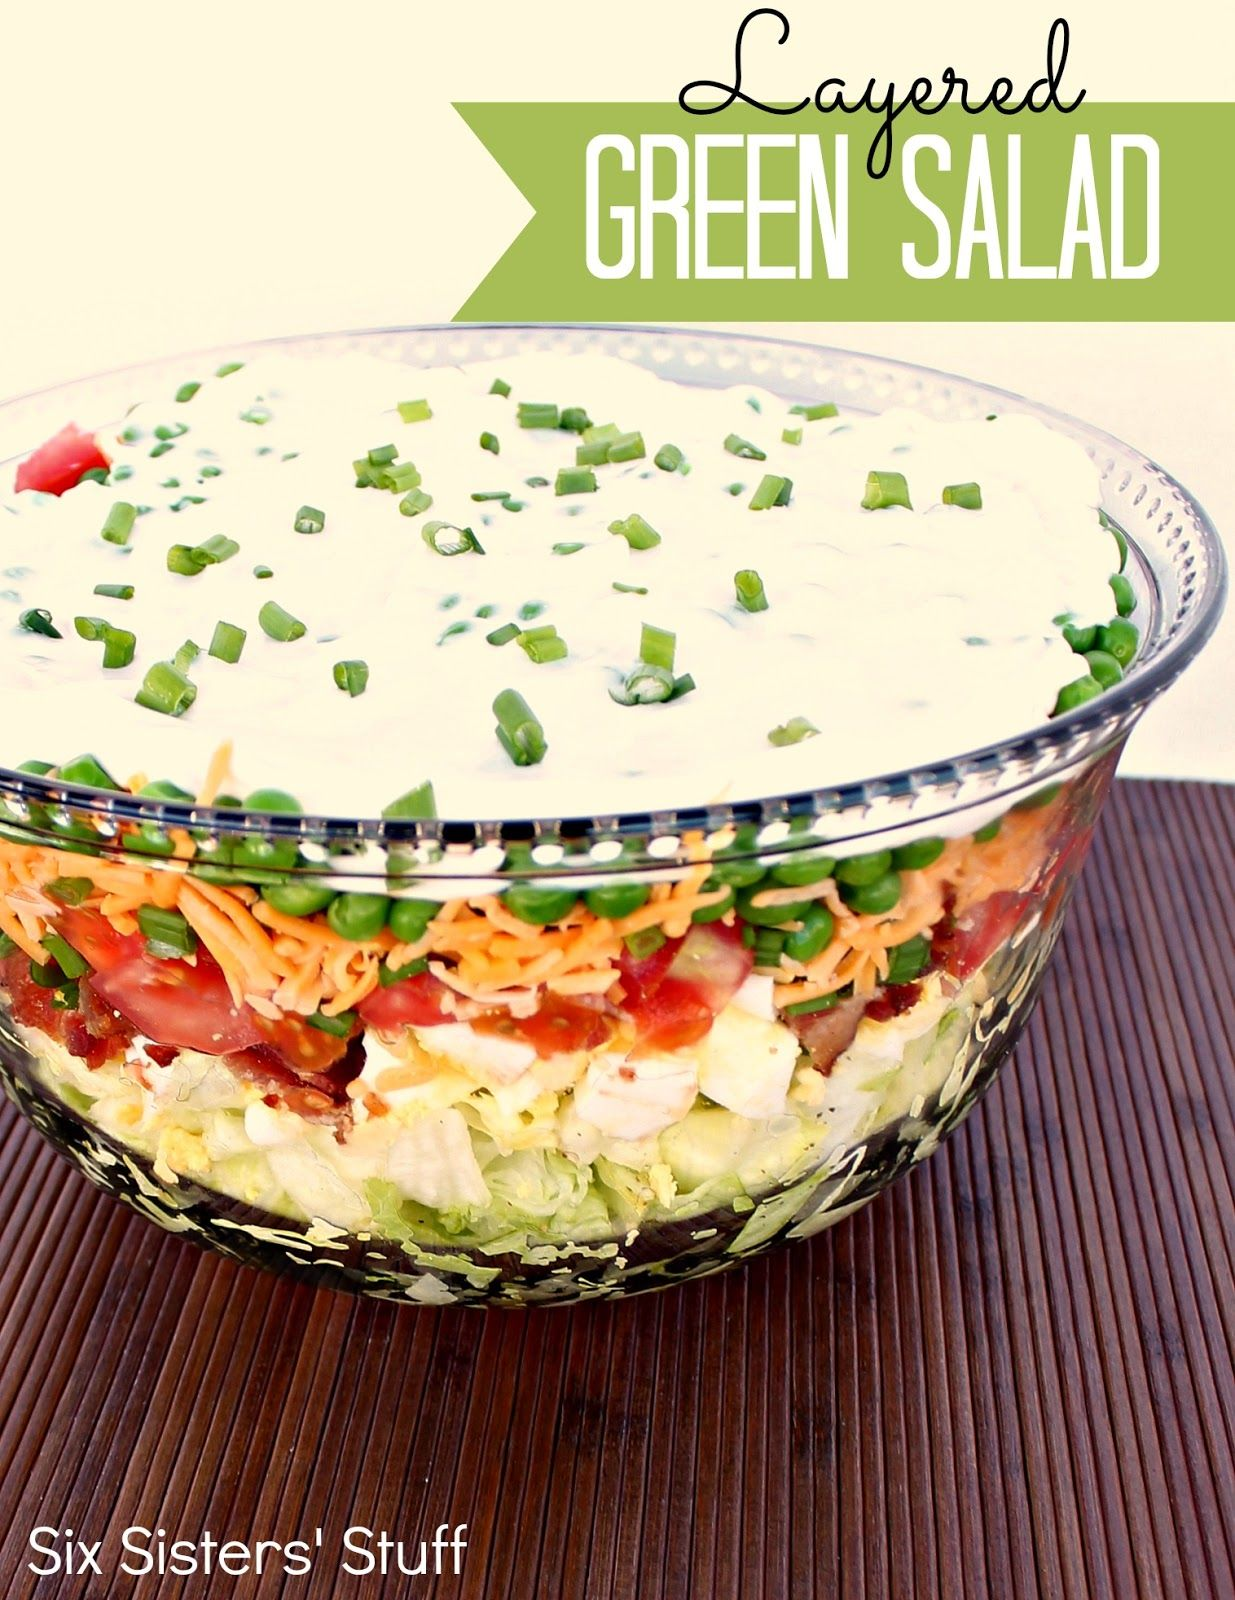 Six Sisters Stuff Family Recipes Food Fun Crafts Green Salad Recipes Salad Recipes Layered Salad